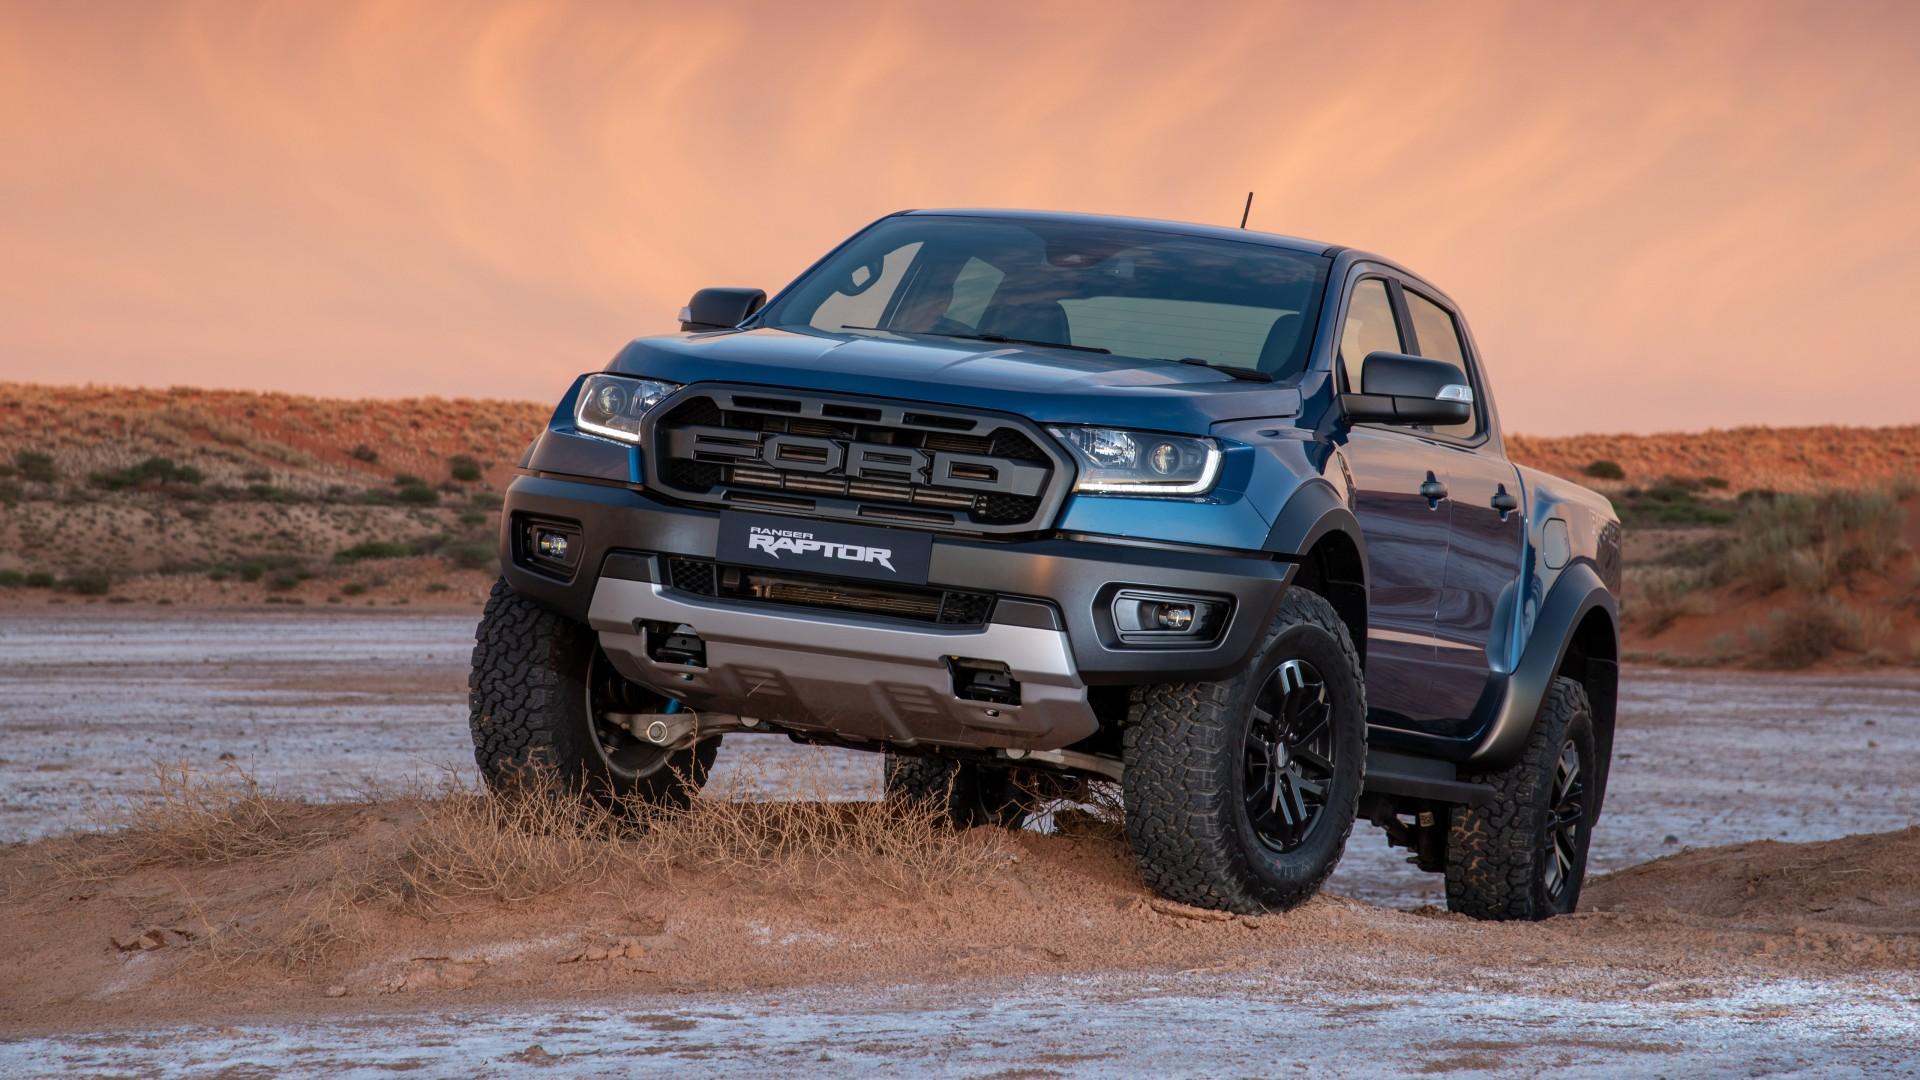 Ford Ranger Raptor 2019 Wallpaper | HD Car Wallpapers | ID ...